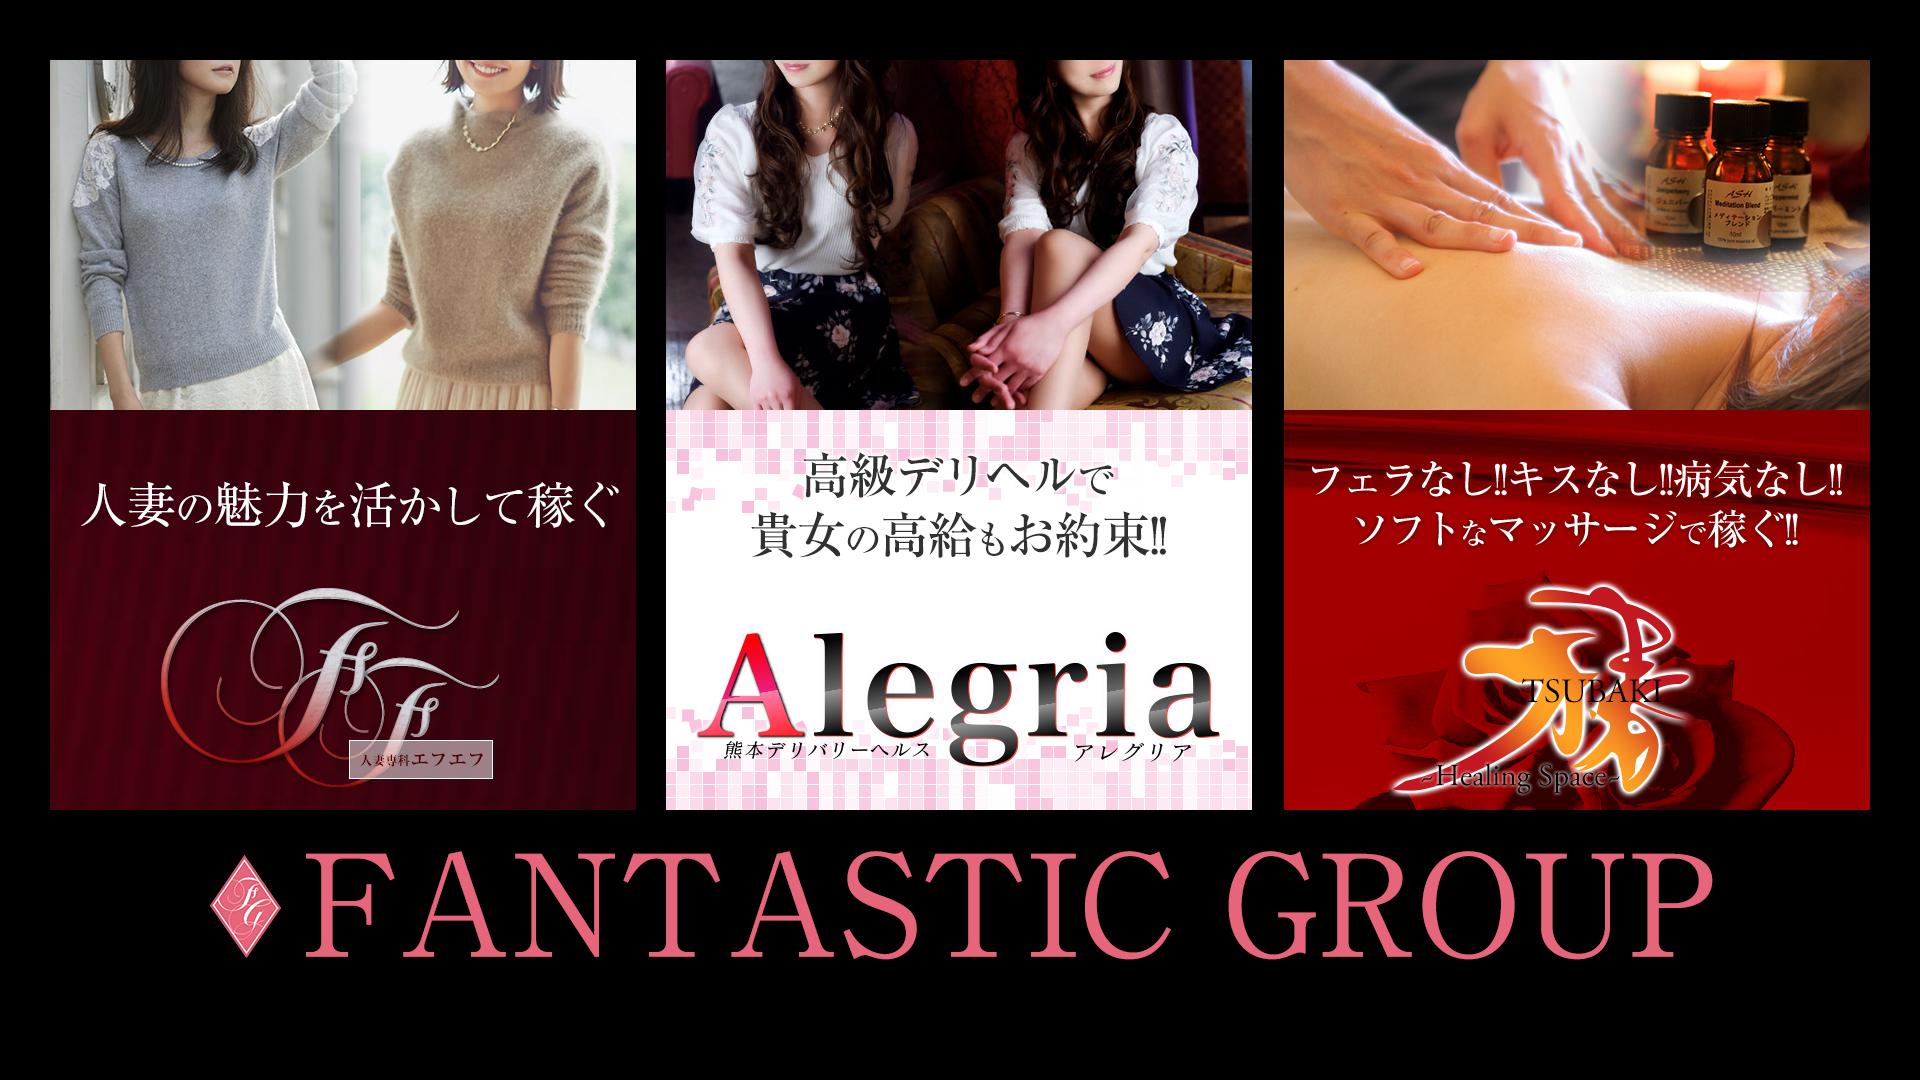 FANTASTIC GROUP